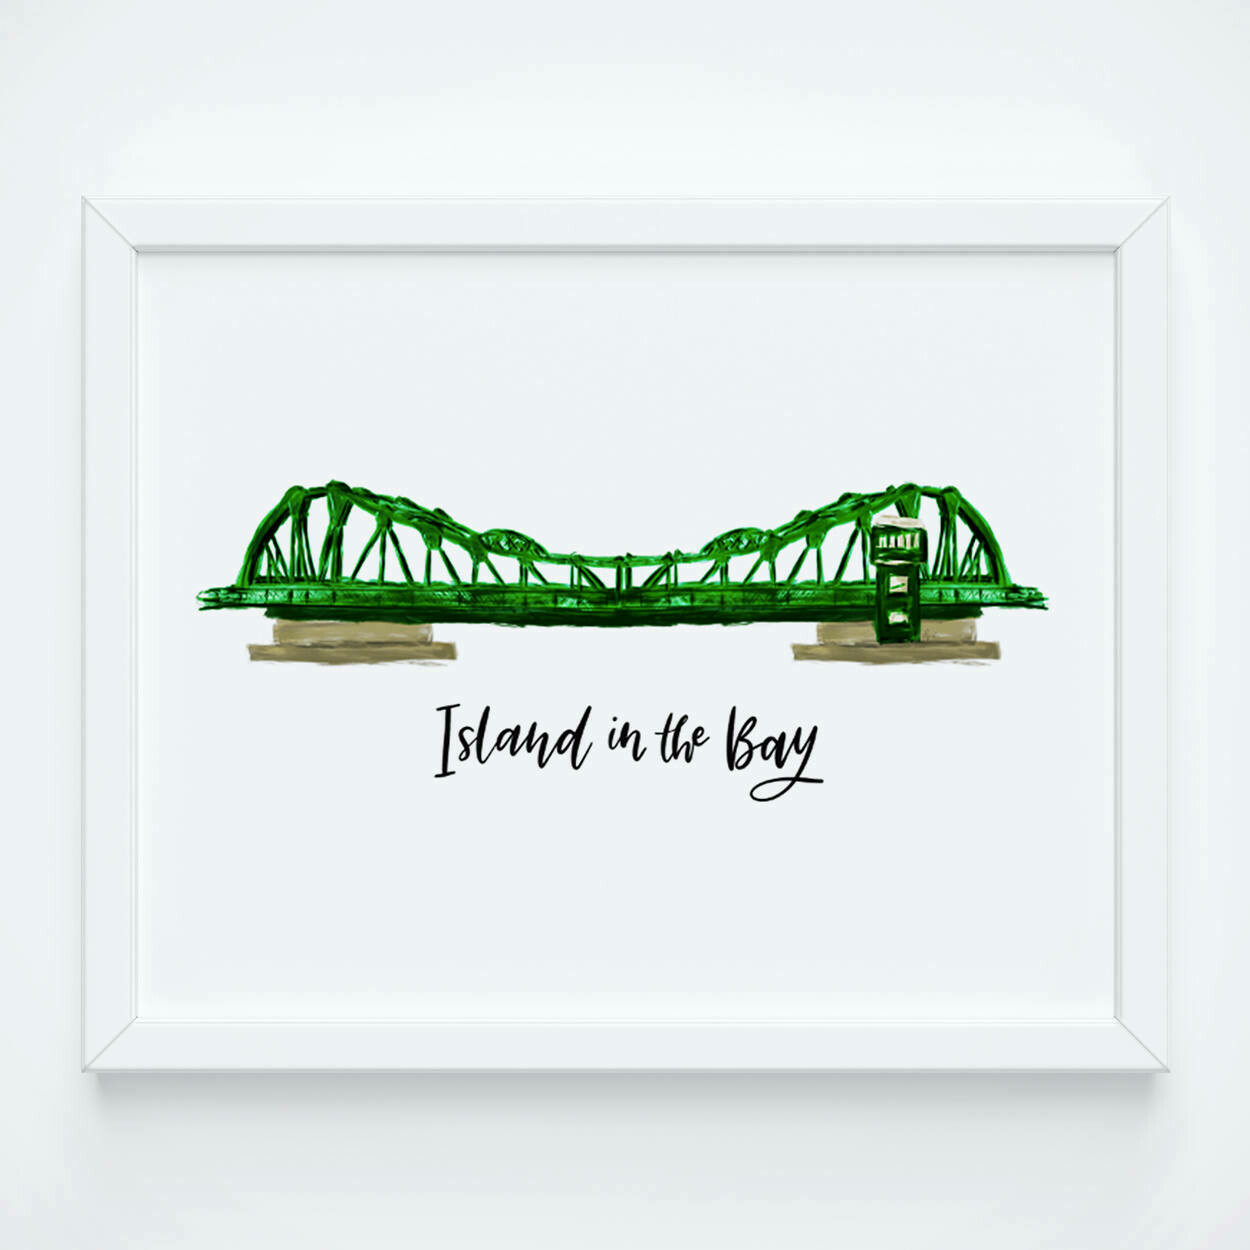 Park St Bridge - Island in the Bay, 8x10 Art Print